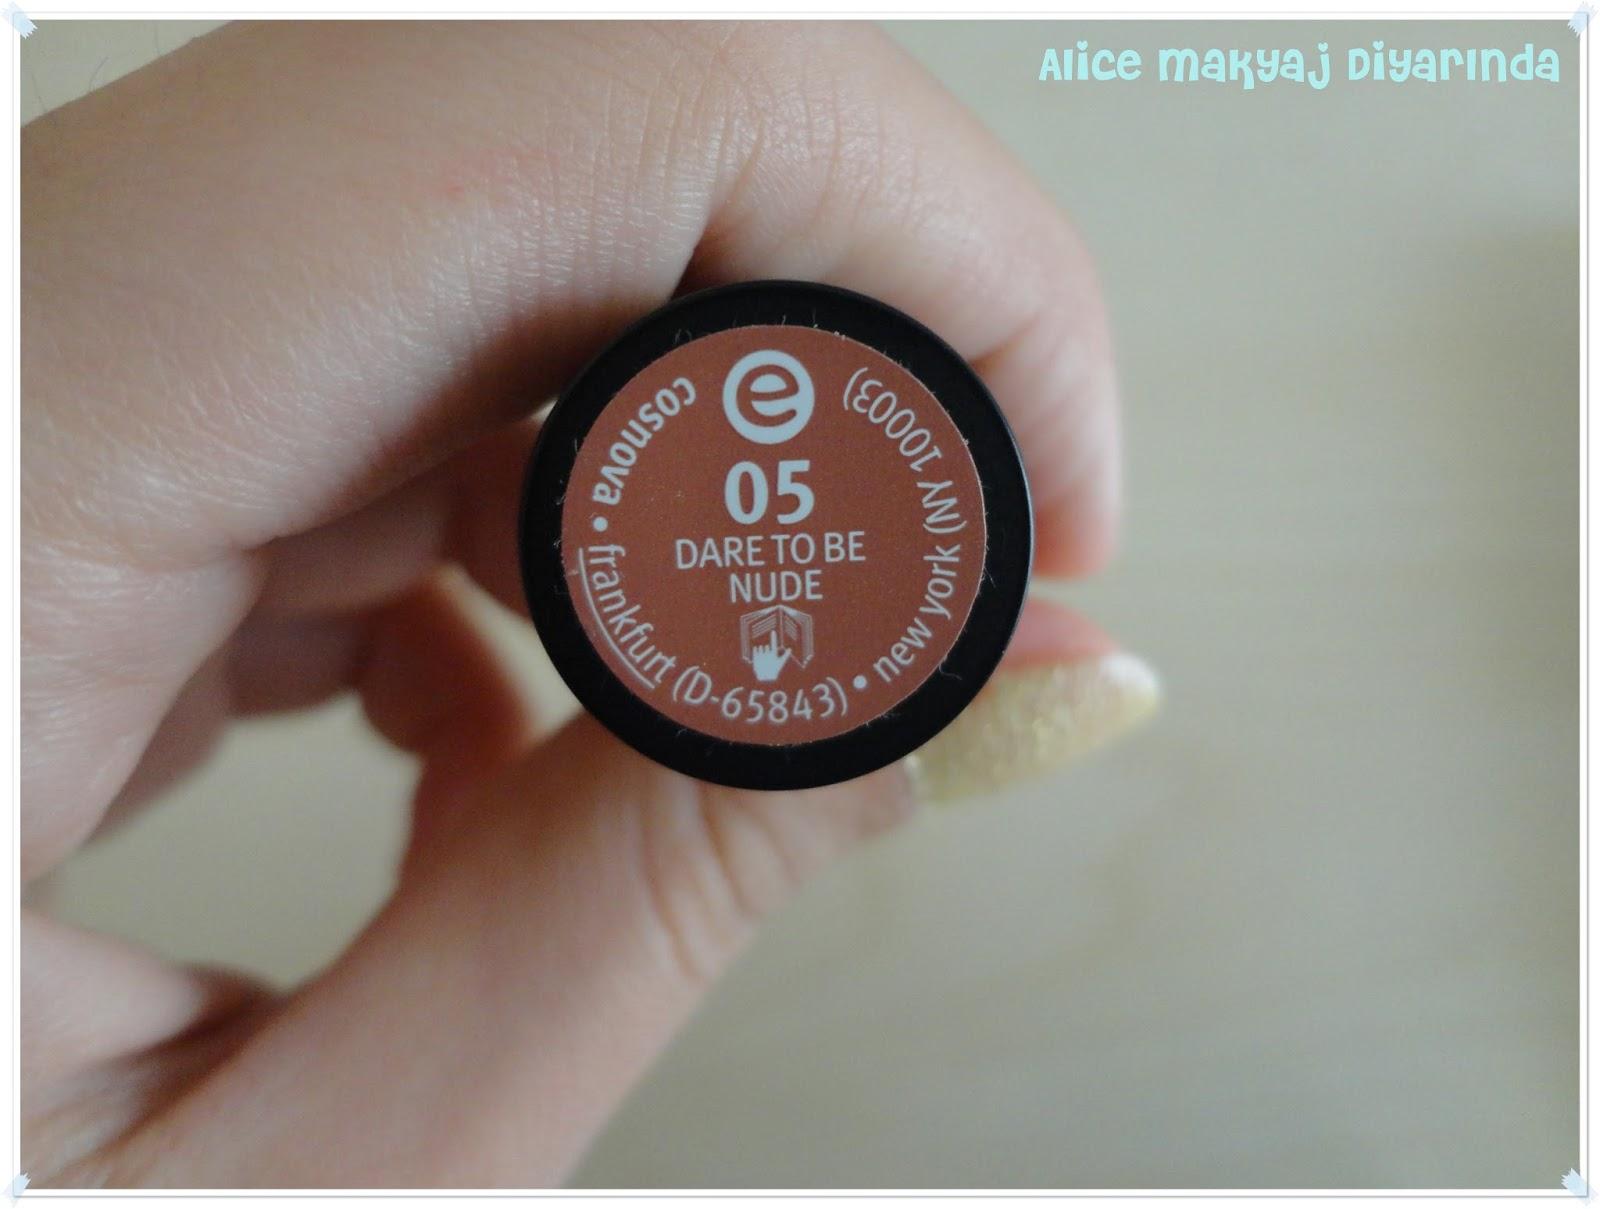 Essence Long Lasting Ruj-05- Dare to be Nude